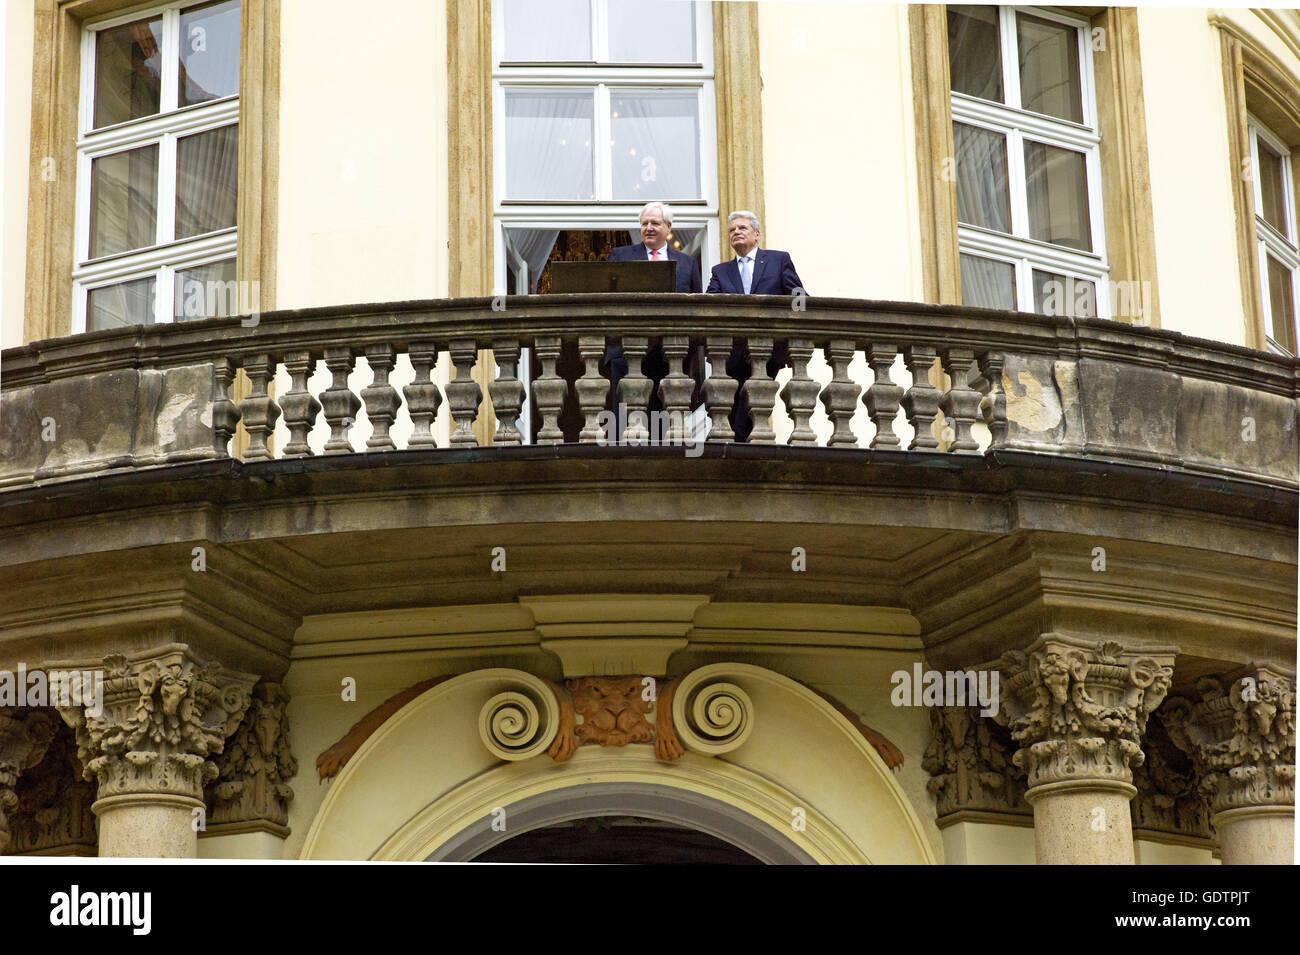 Lingemann and Gauck - Stock Image